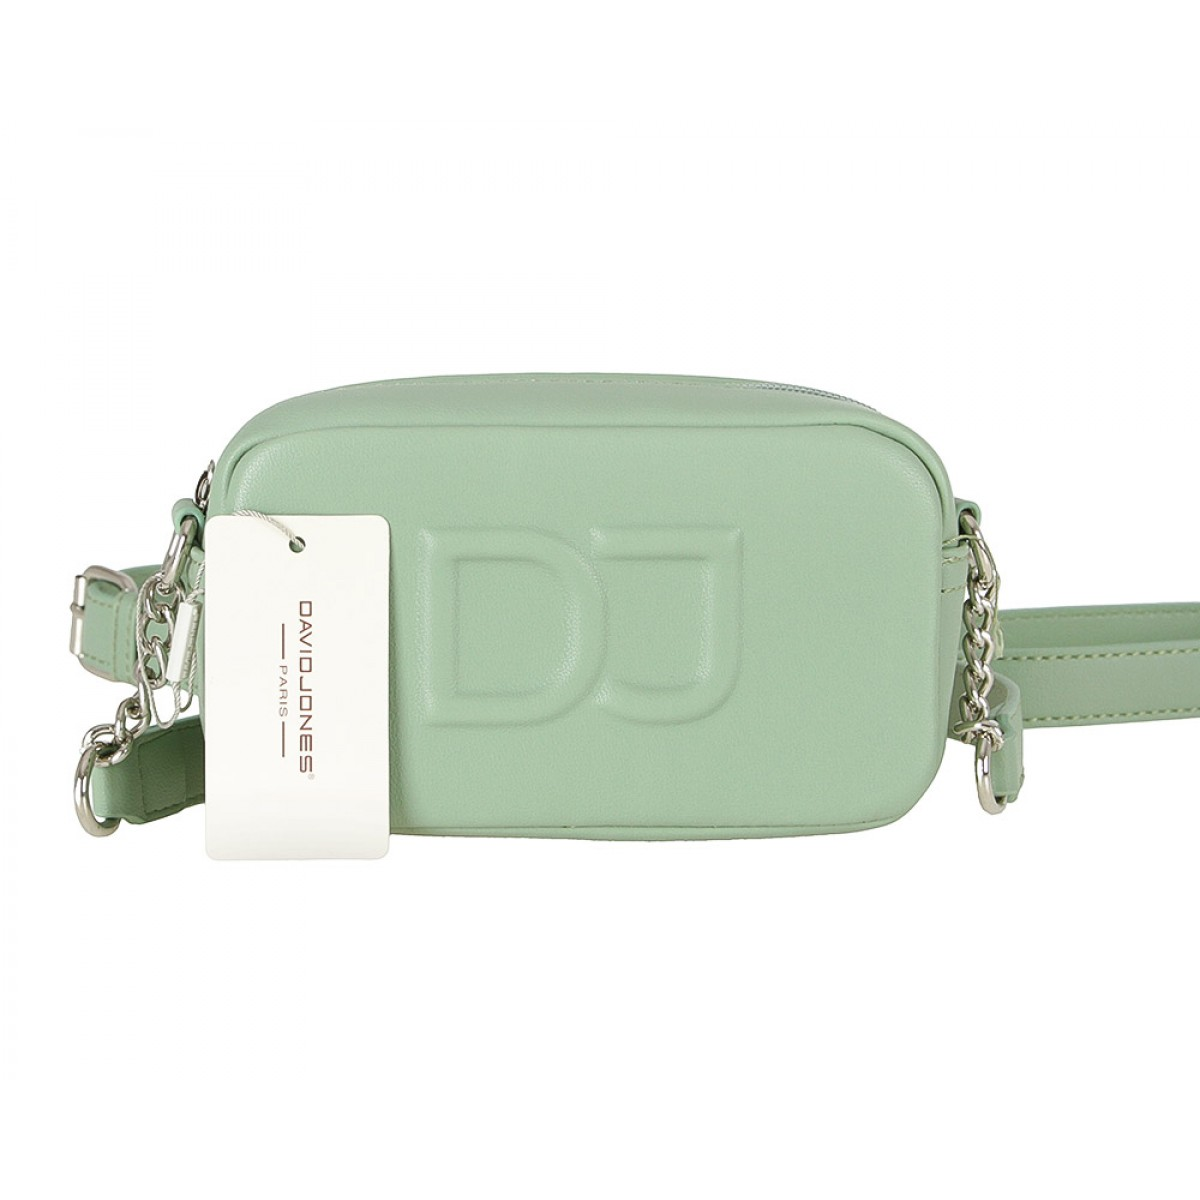 Жіноча сумка David Jones 6260-1 LIGHT GREEN